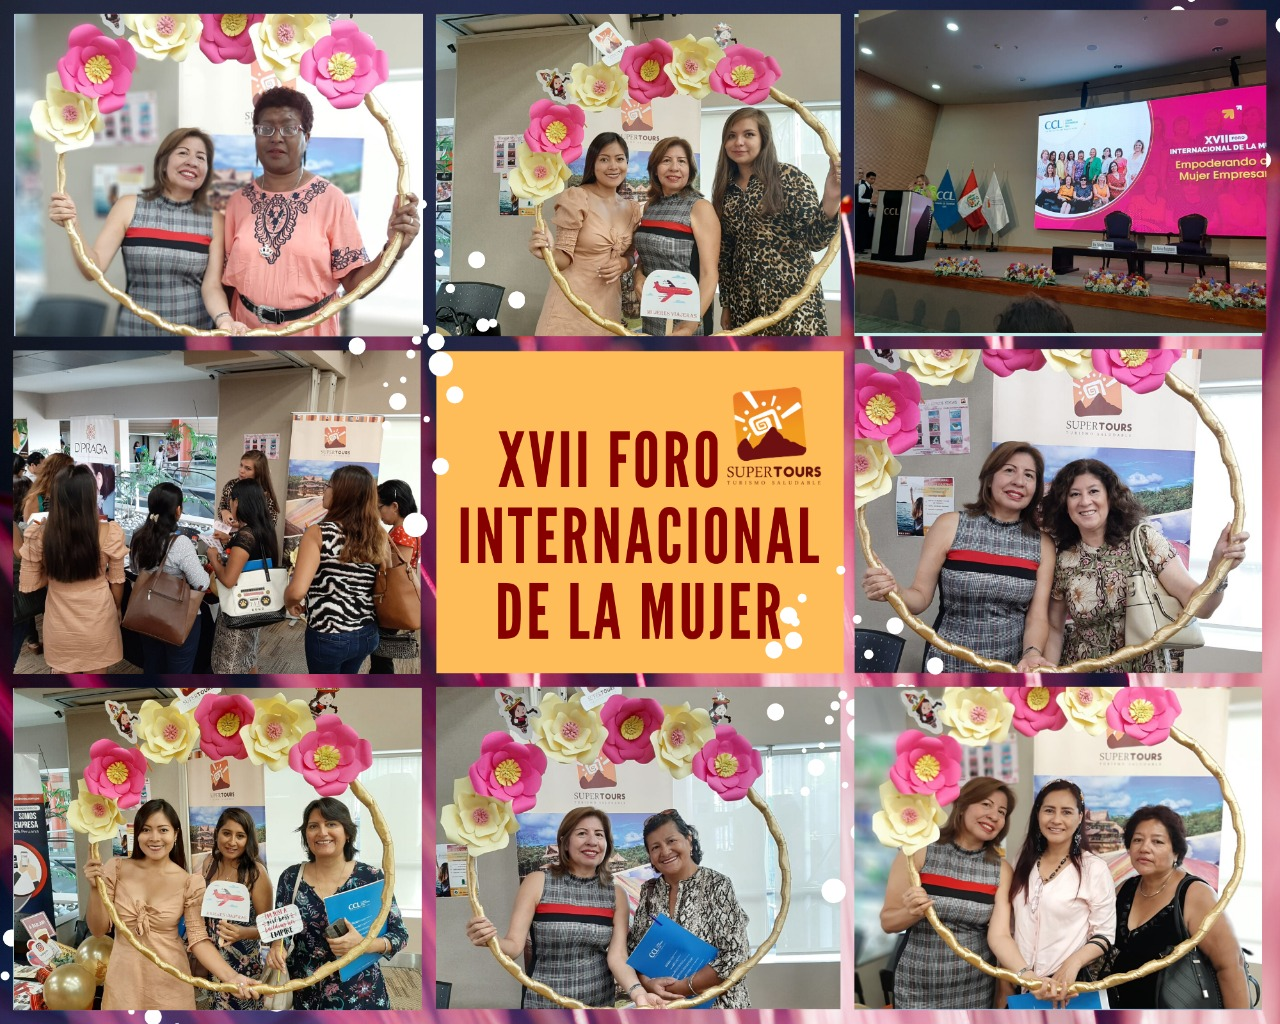 XVII FORO INTERNACIONAL DE LA MUJER